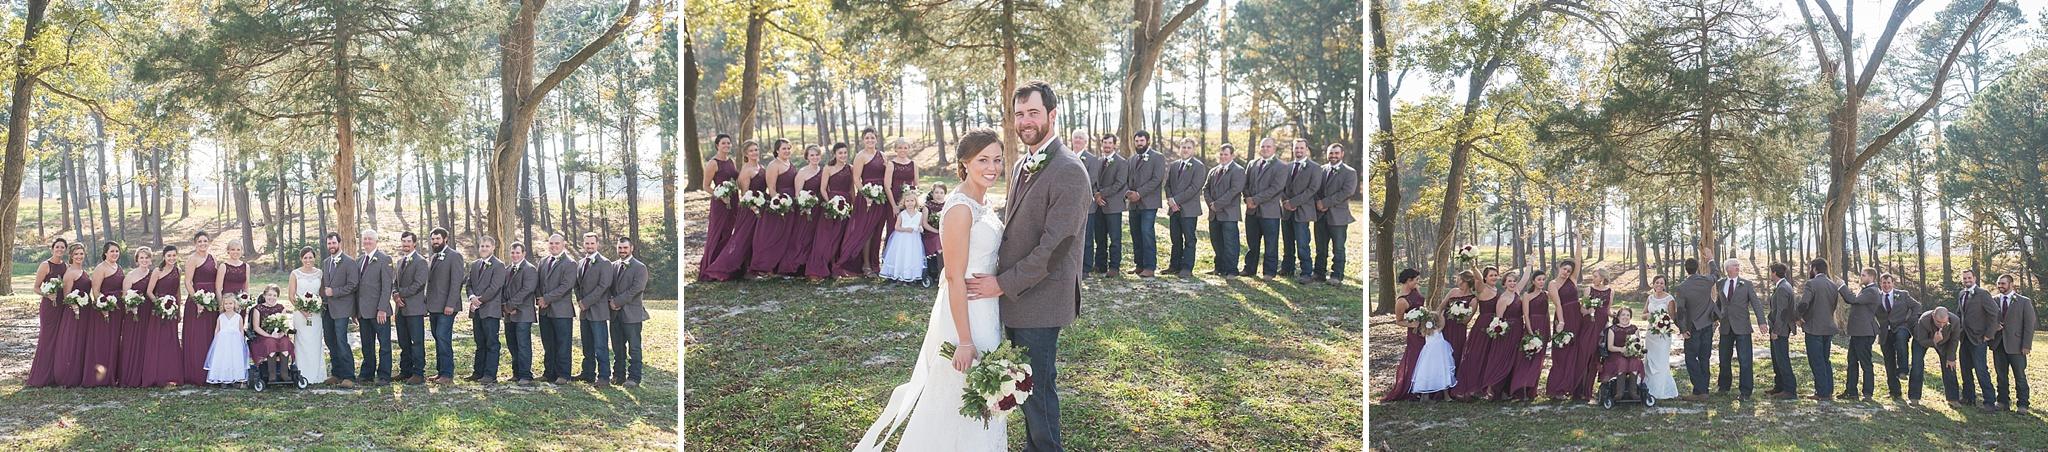 May-Lew-Farm-Farmville-NC-Wedding-Photographer-071.jpg